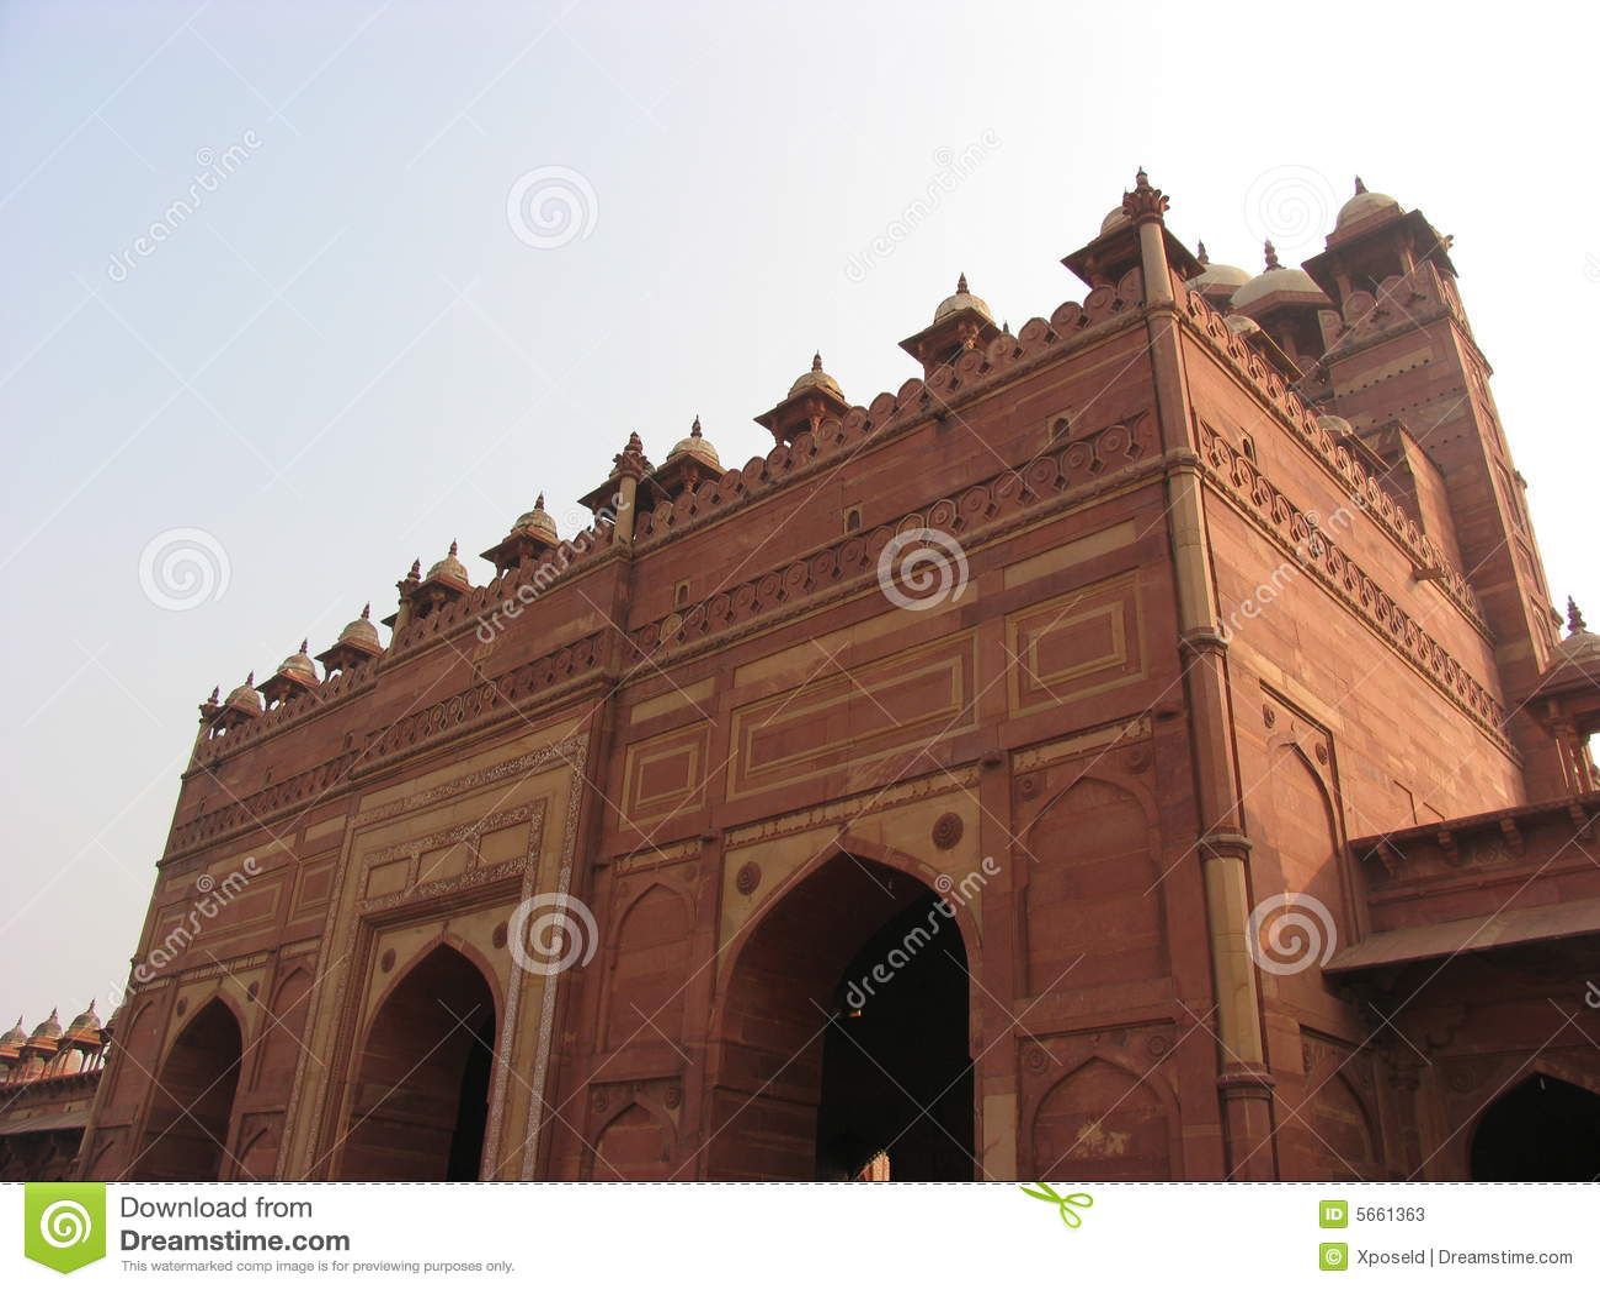 mughal architecture india